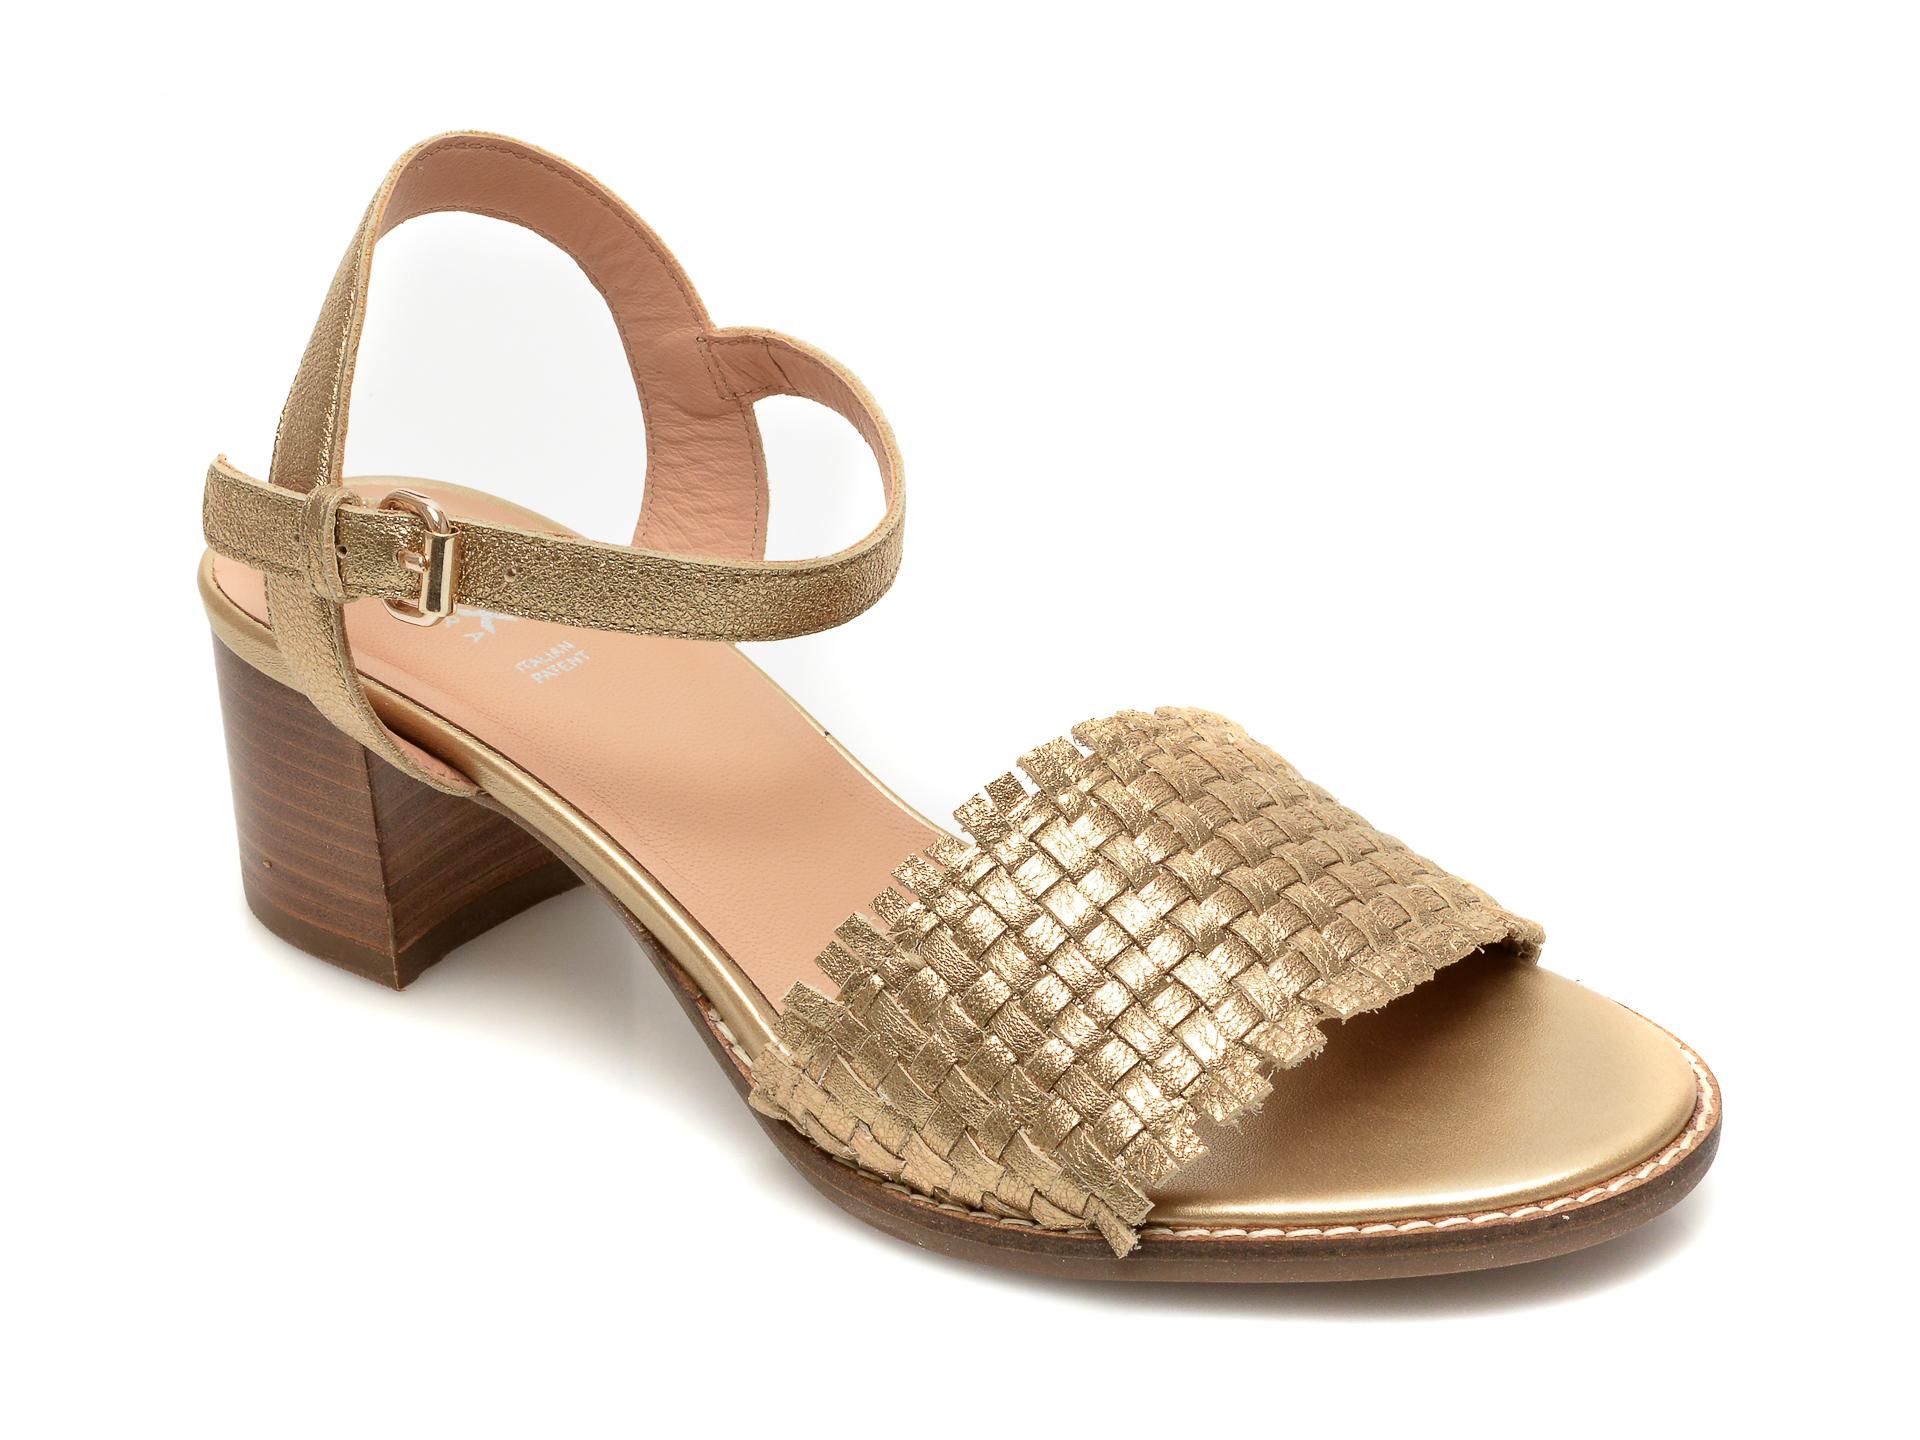 Sandale GEOX aurii, D15MPC, din piele naturala